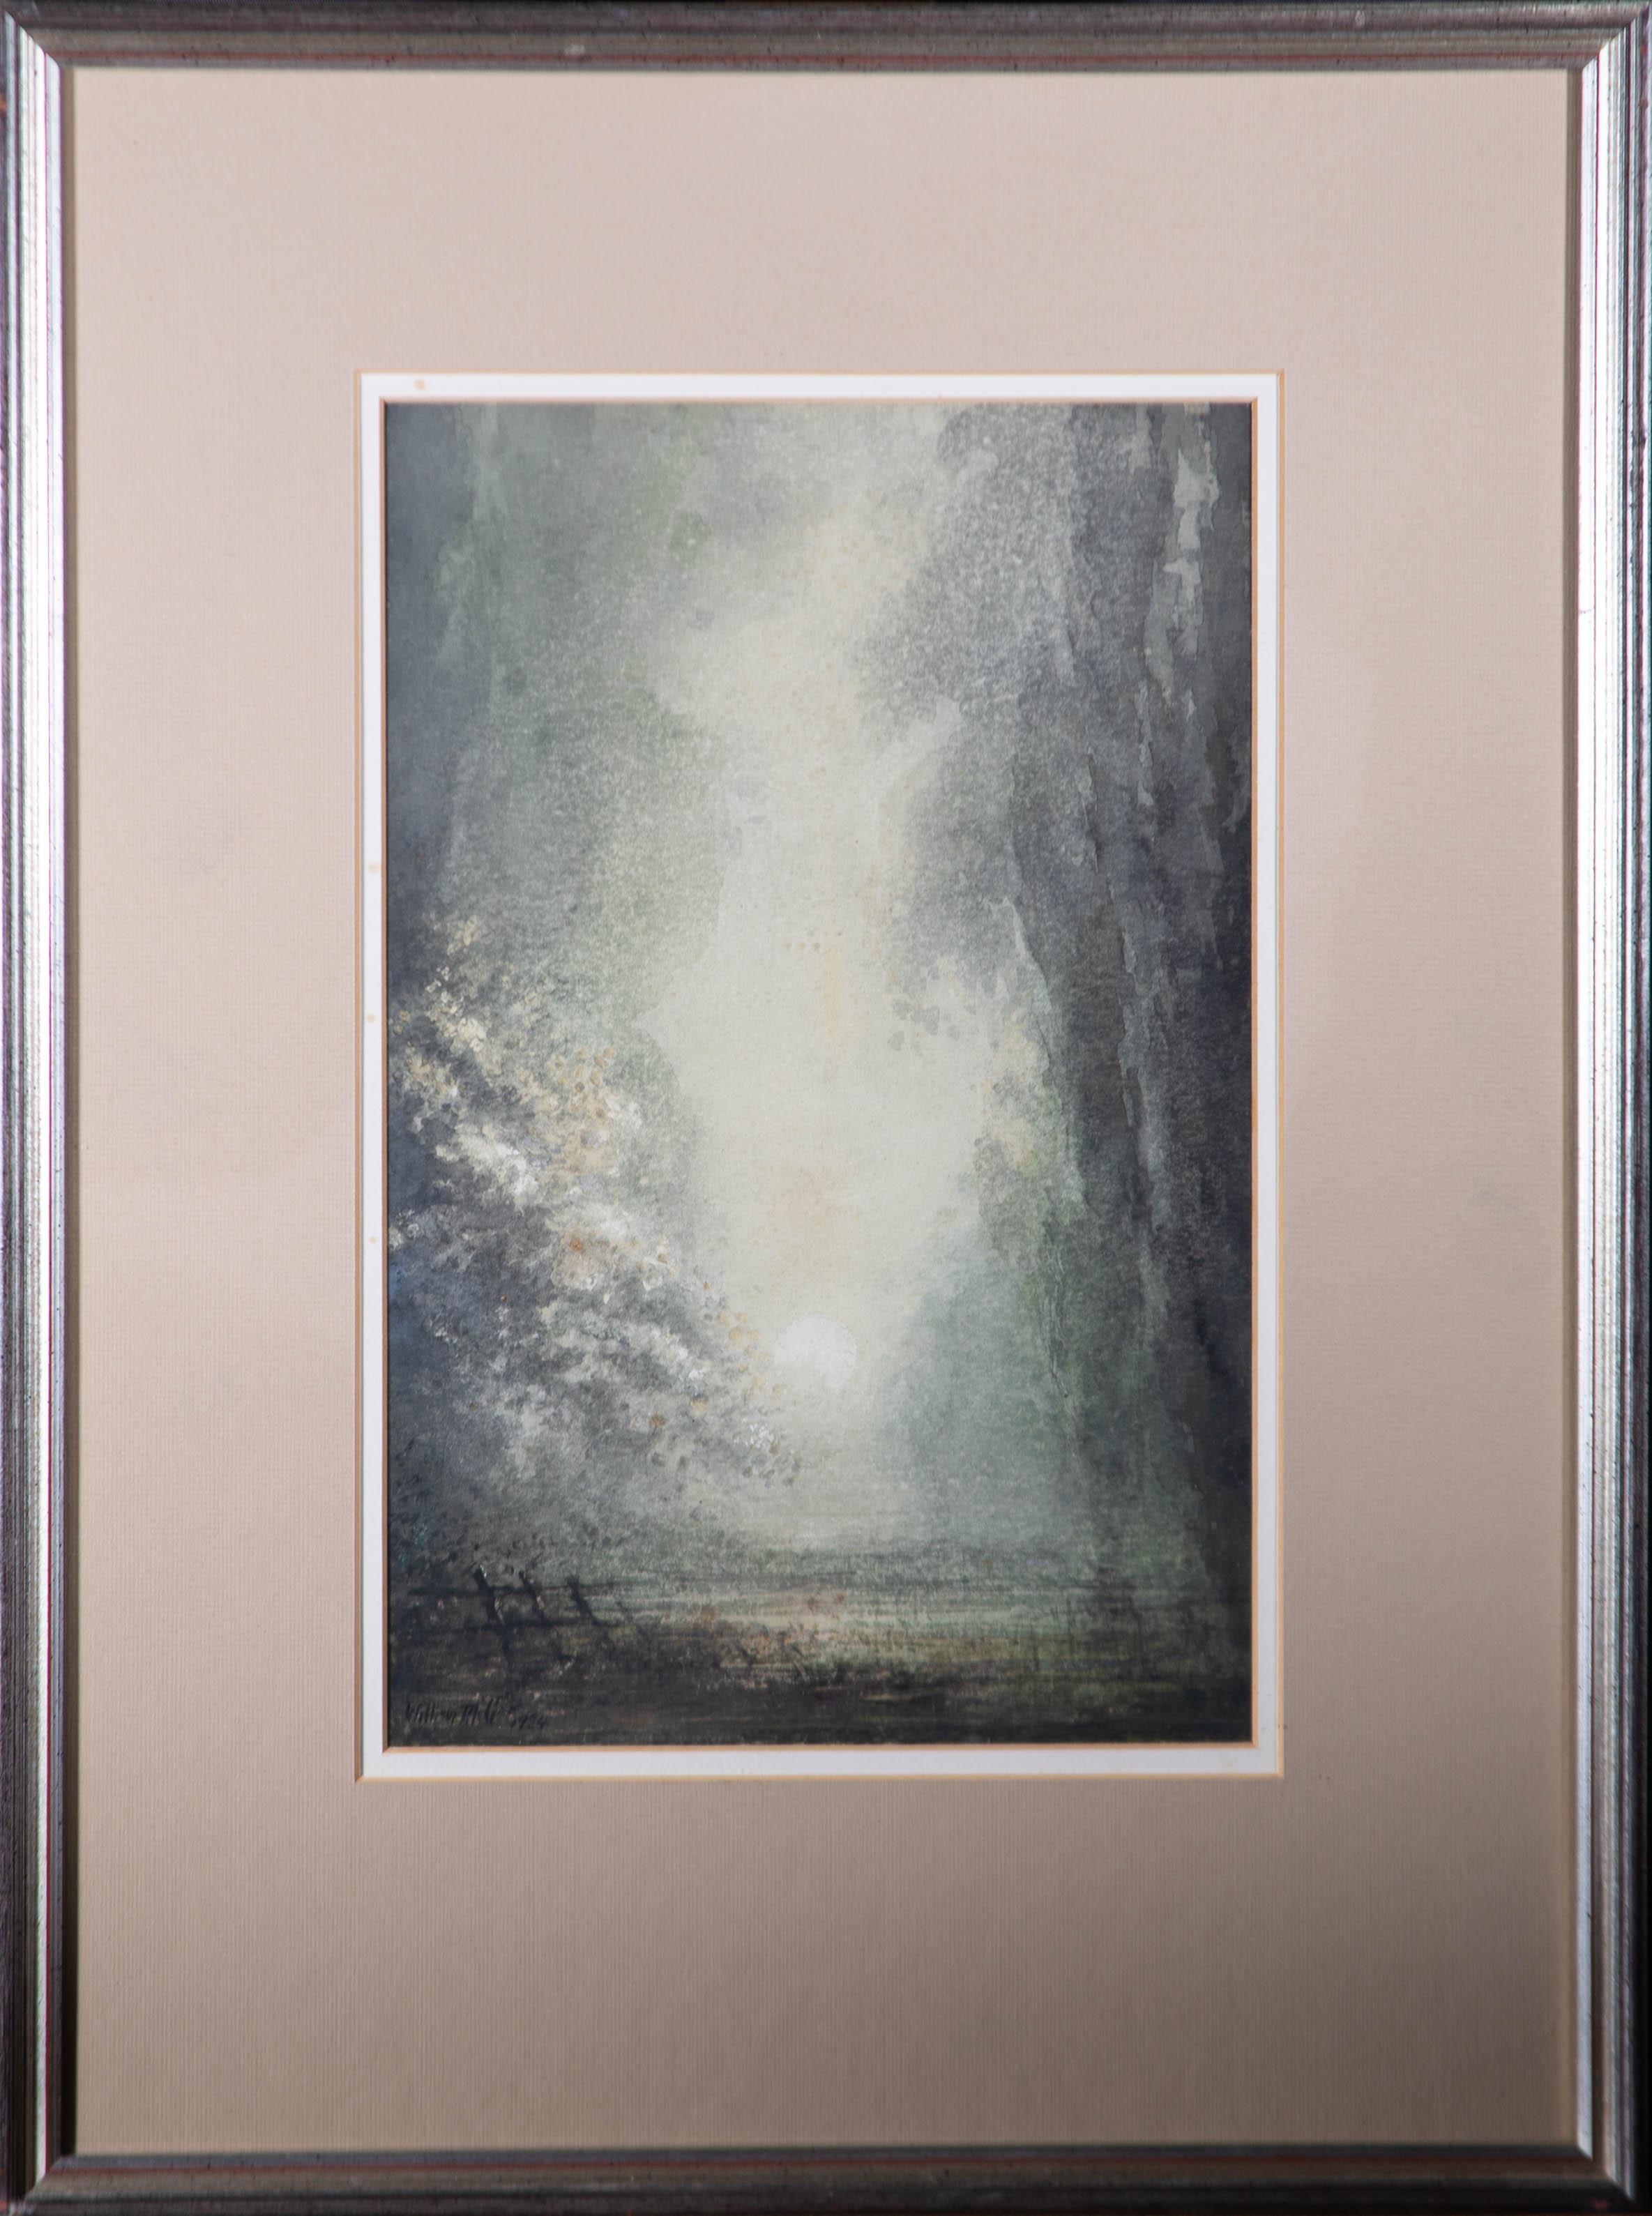 William Miller - 1924 Watercolour, Moonlight Landscape